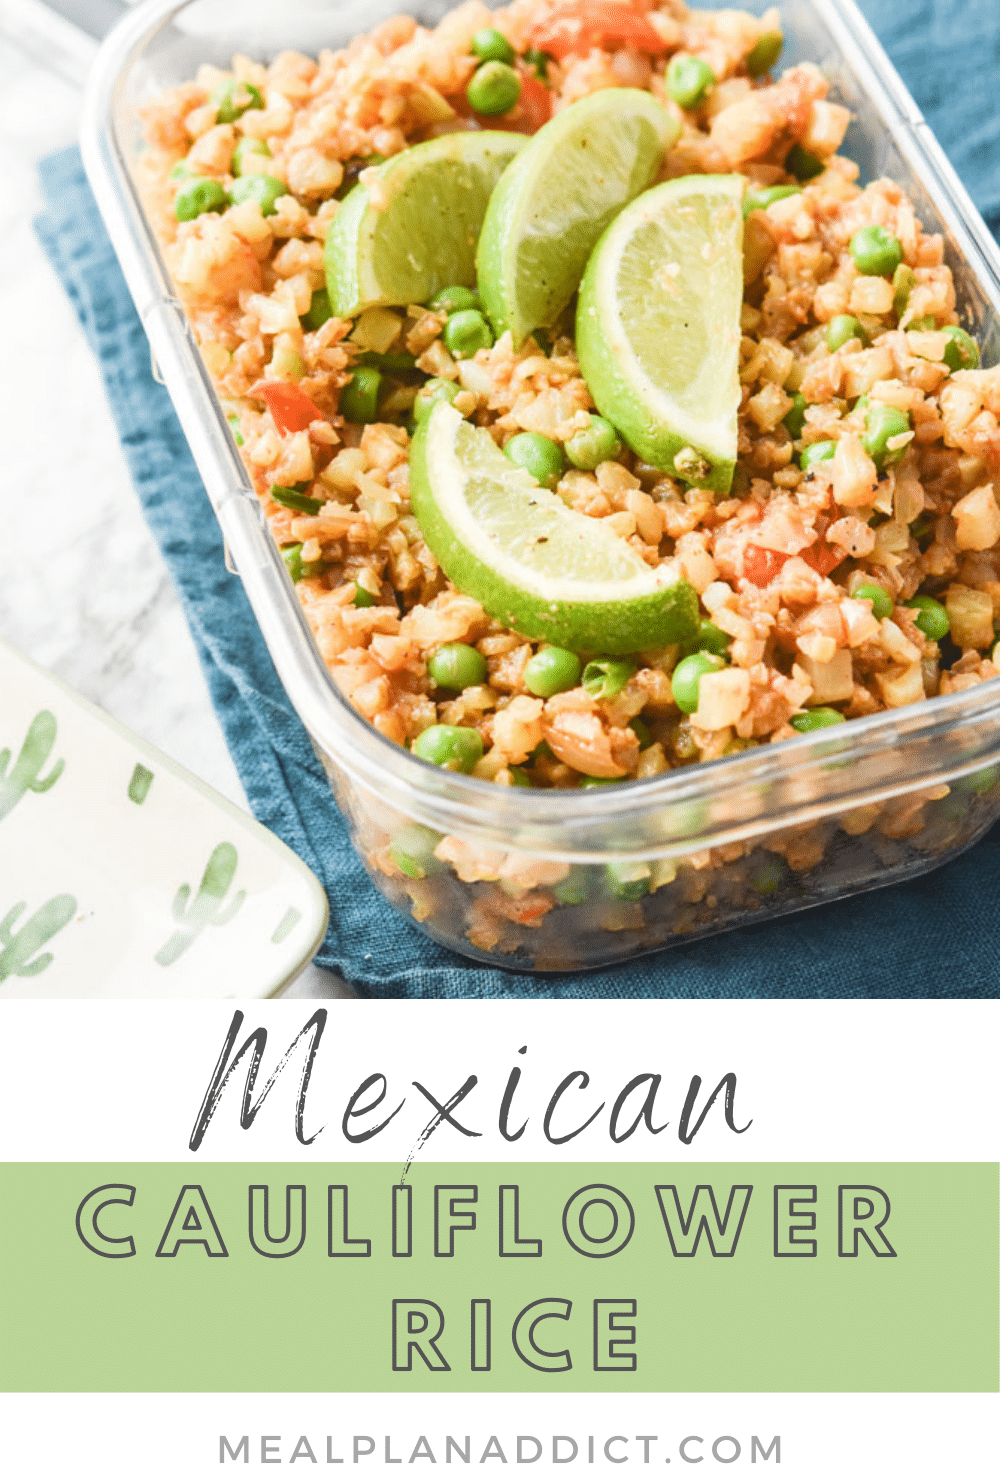 Cauliflower Rice pin for Pinterest